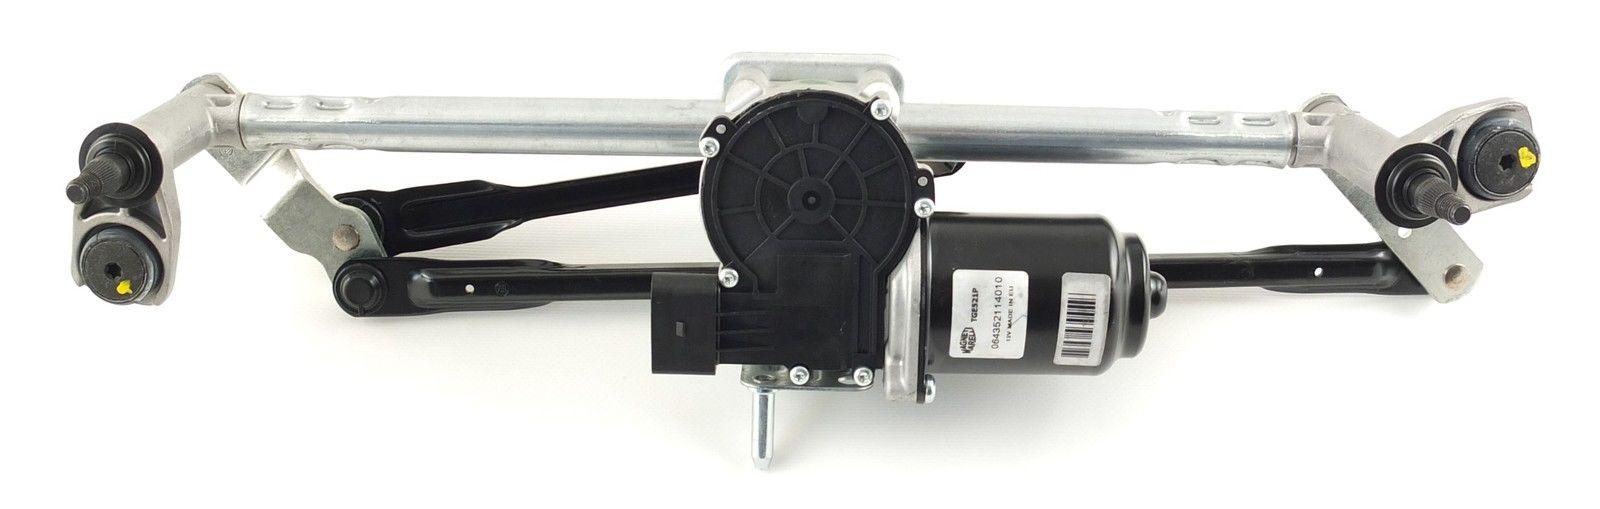 Mecanism stergatoare parbriz Seat Toledo 4 (Kg3); Skoda Rapid (Nh3) Magneti Marelli 064352114010, parte montare : Punte Fata